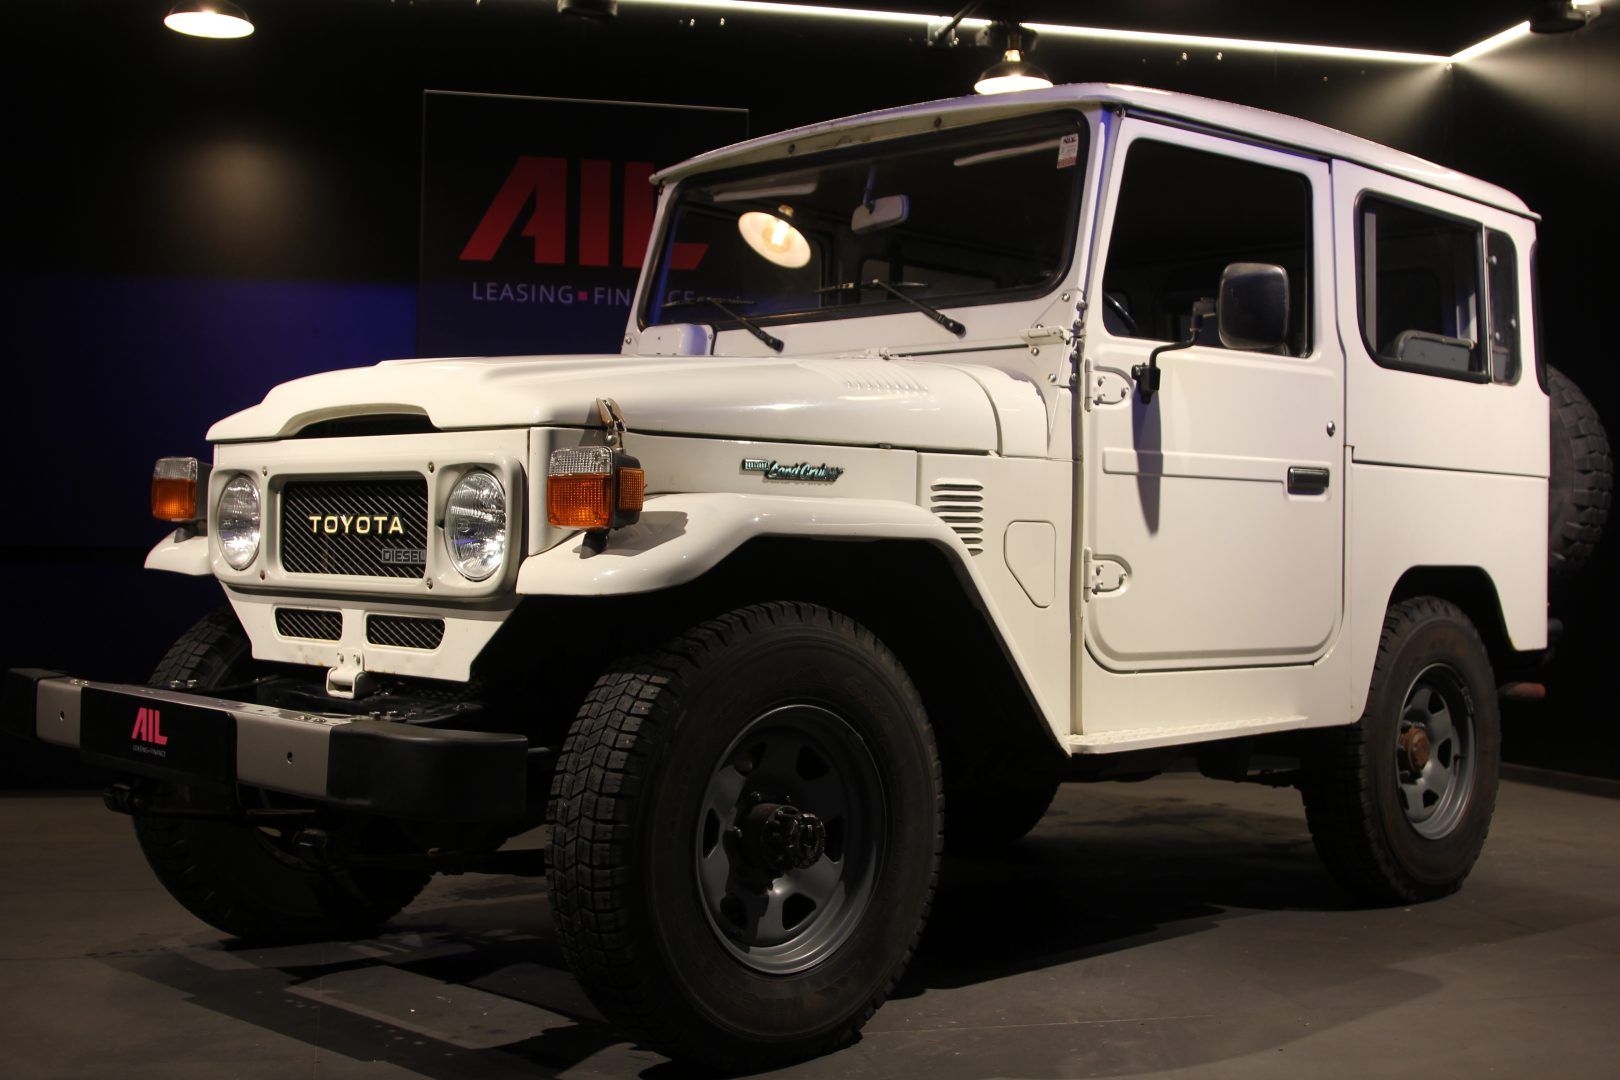 AIL Toyota Landcruiser  7